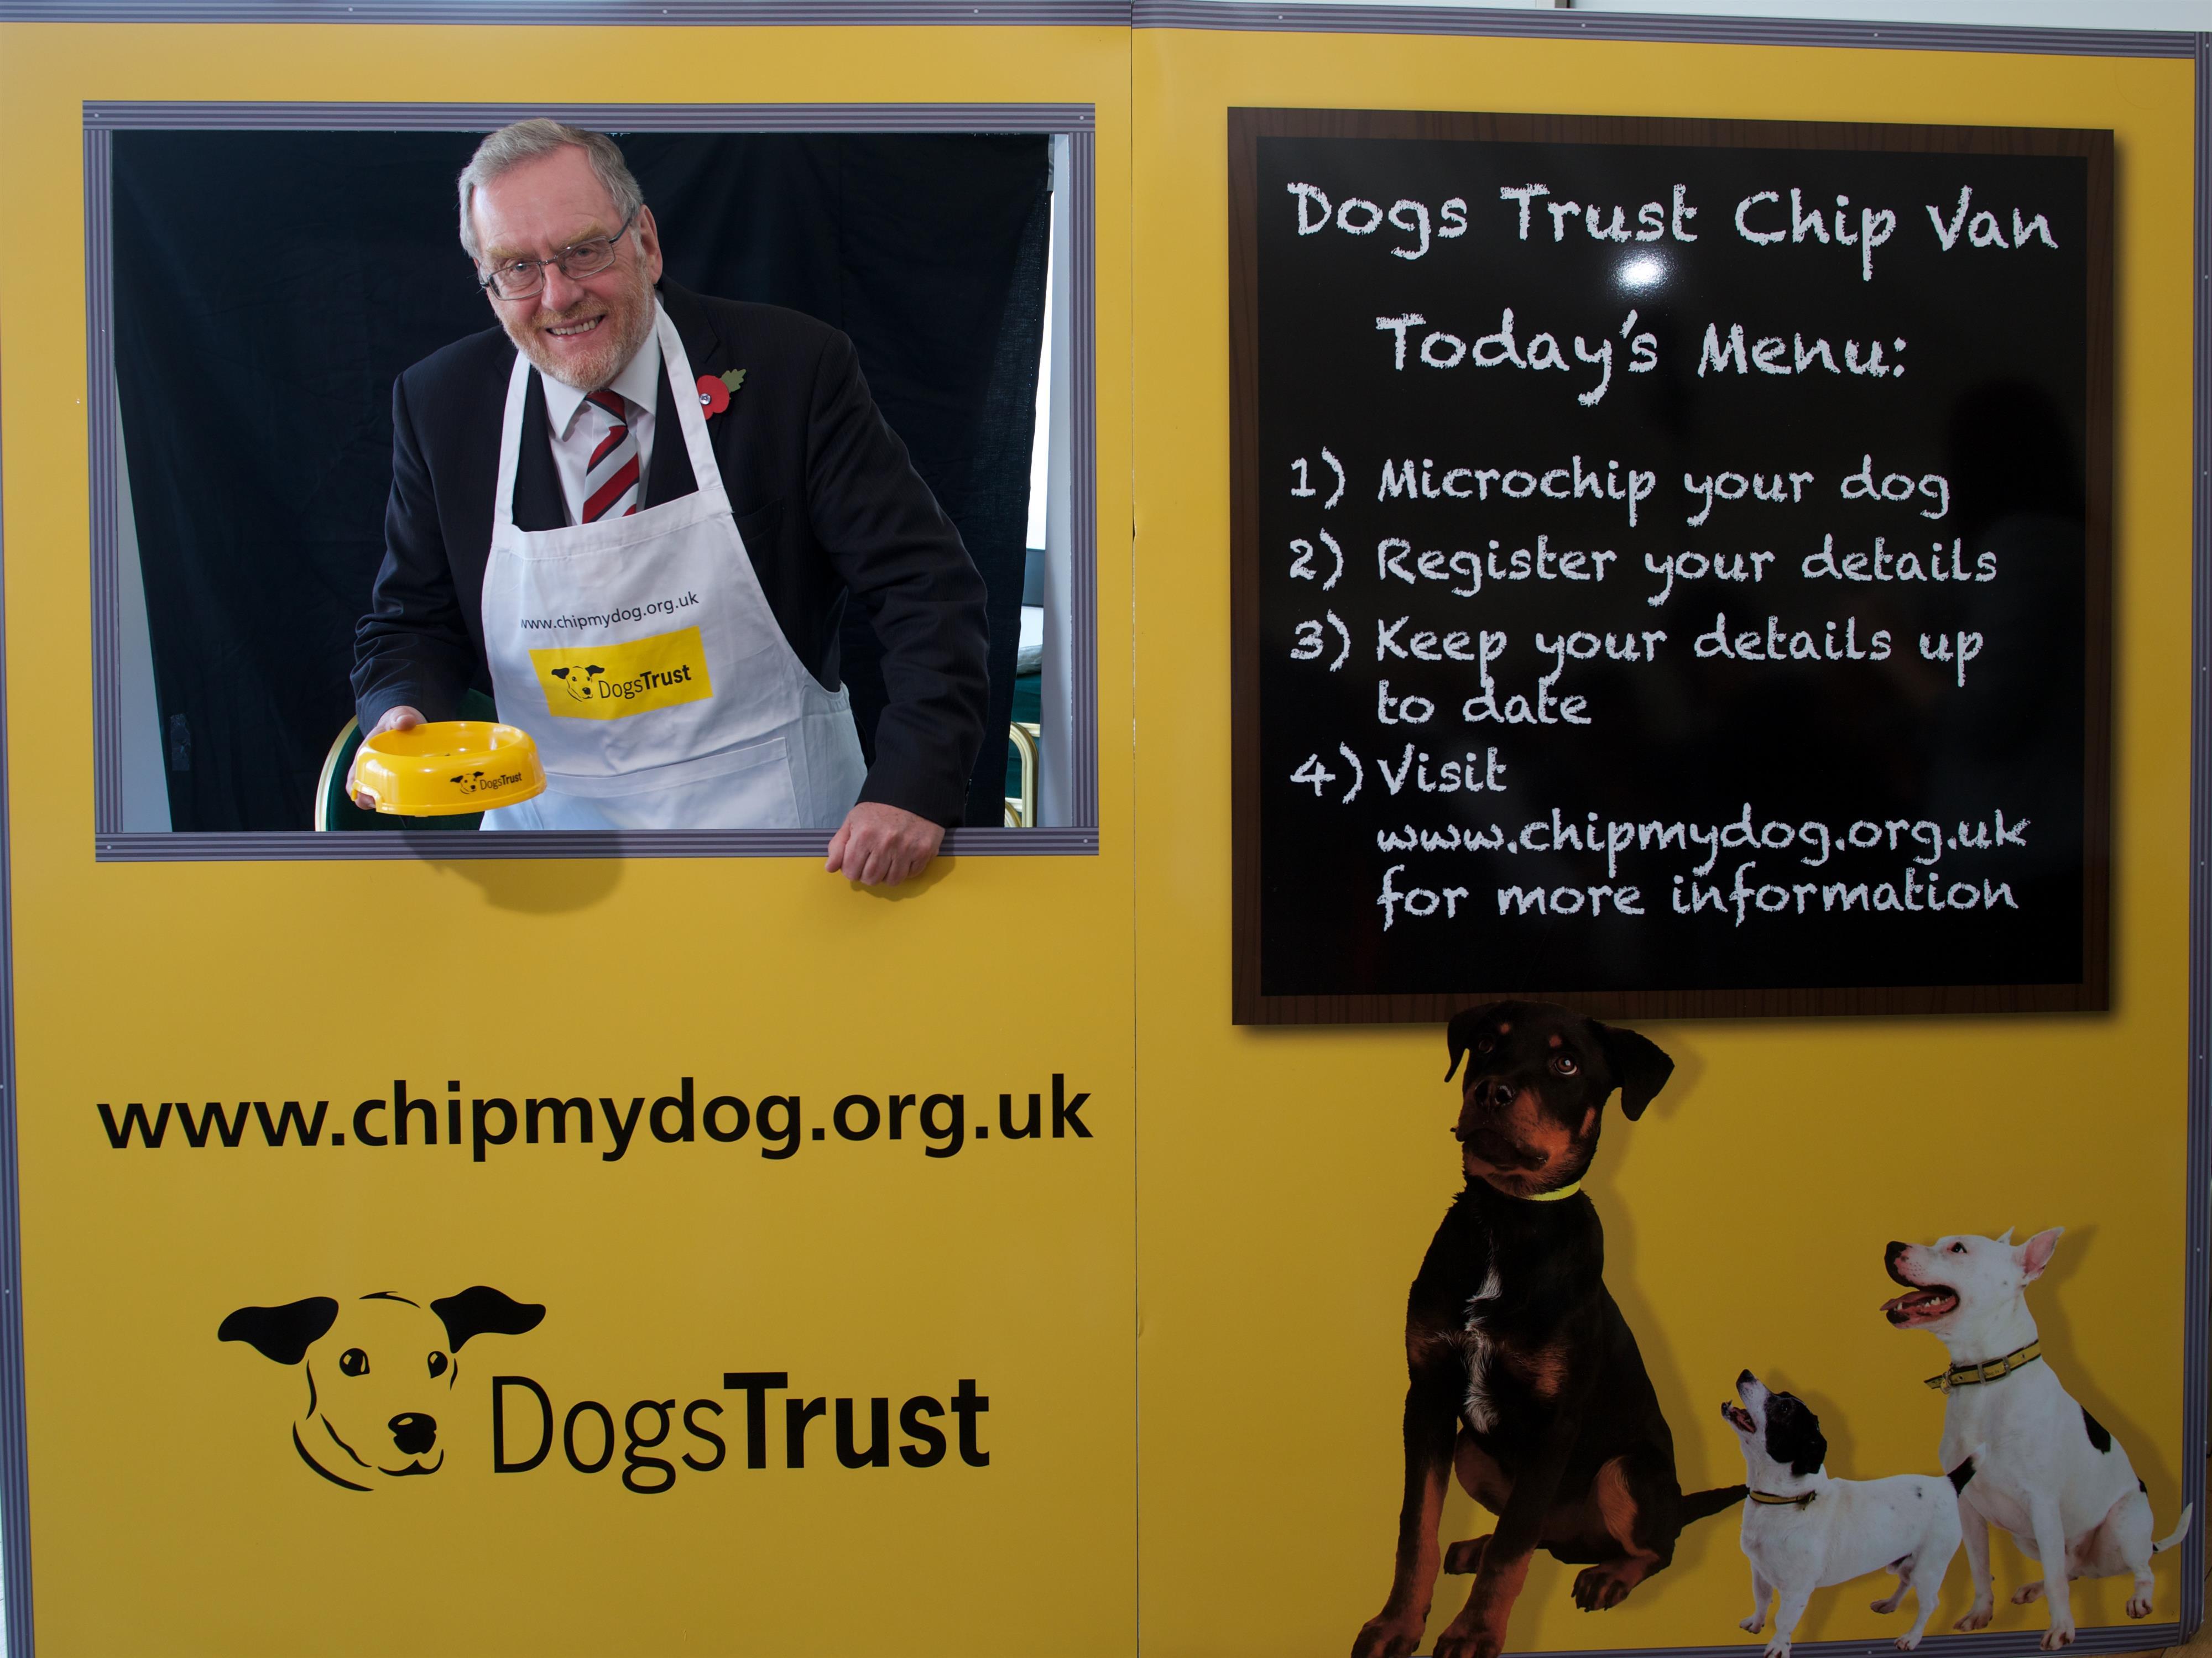 John Spellar MP in the Dogs Trust Chip Van